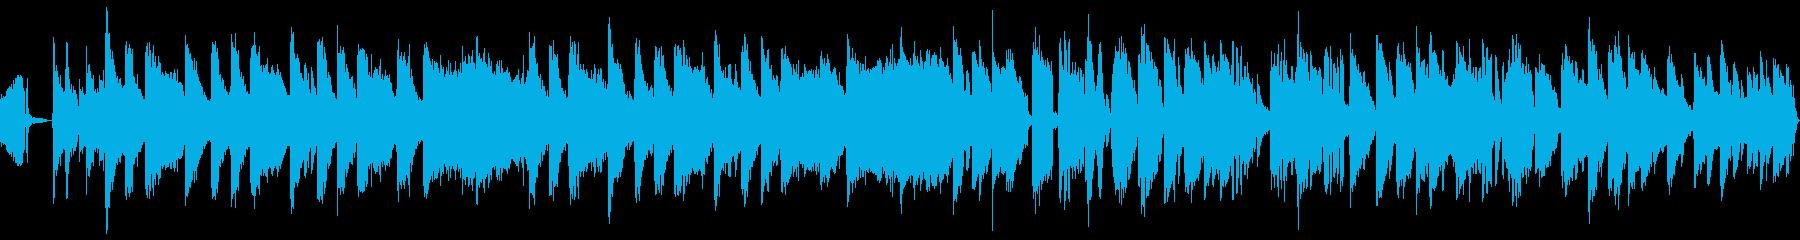 EDM、勢いある明るめスタイリッシュCMの再生済みの波形